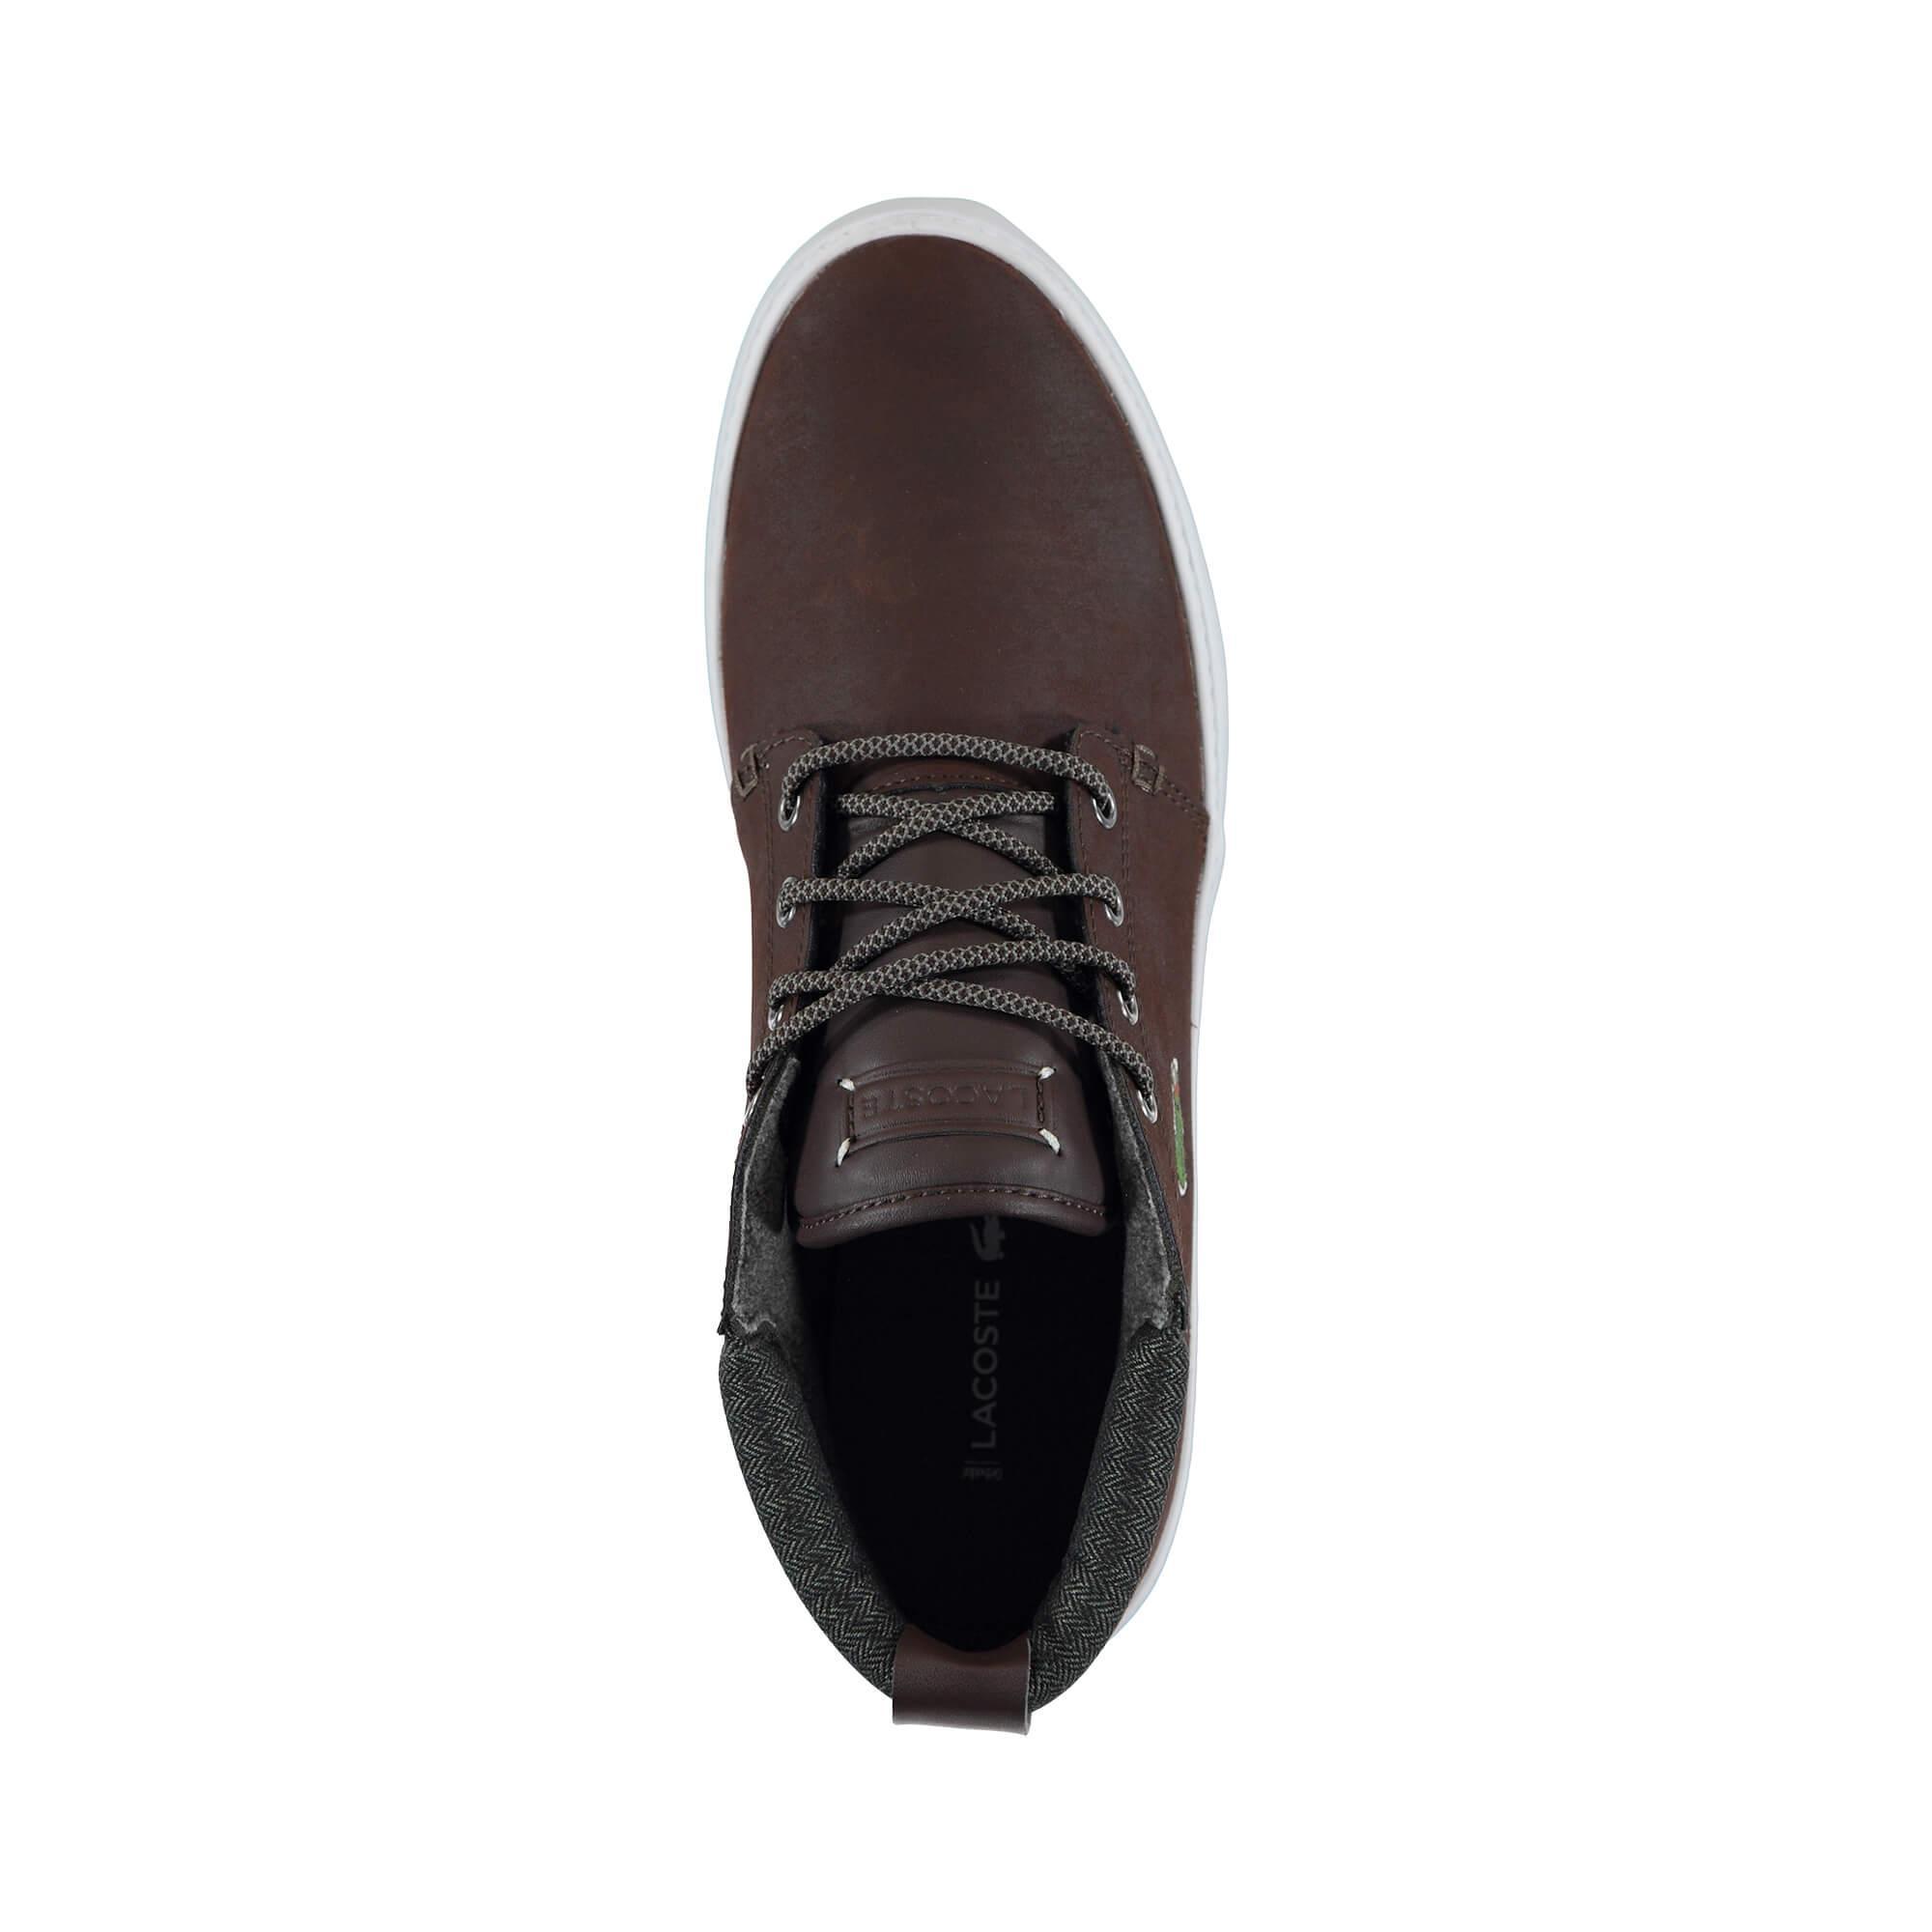 Lacoste Erkek Ampthill Terra 318 1 Kahverengi Ayakkabı